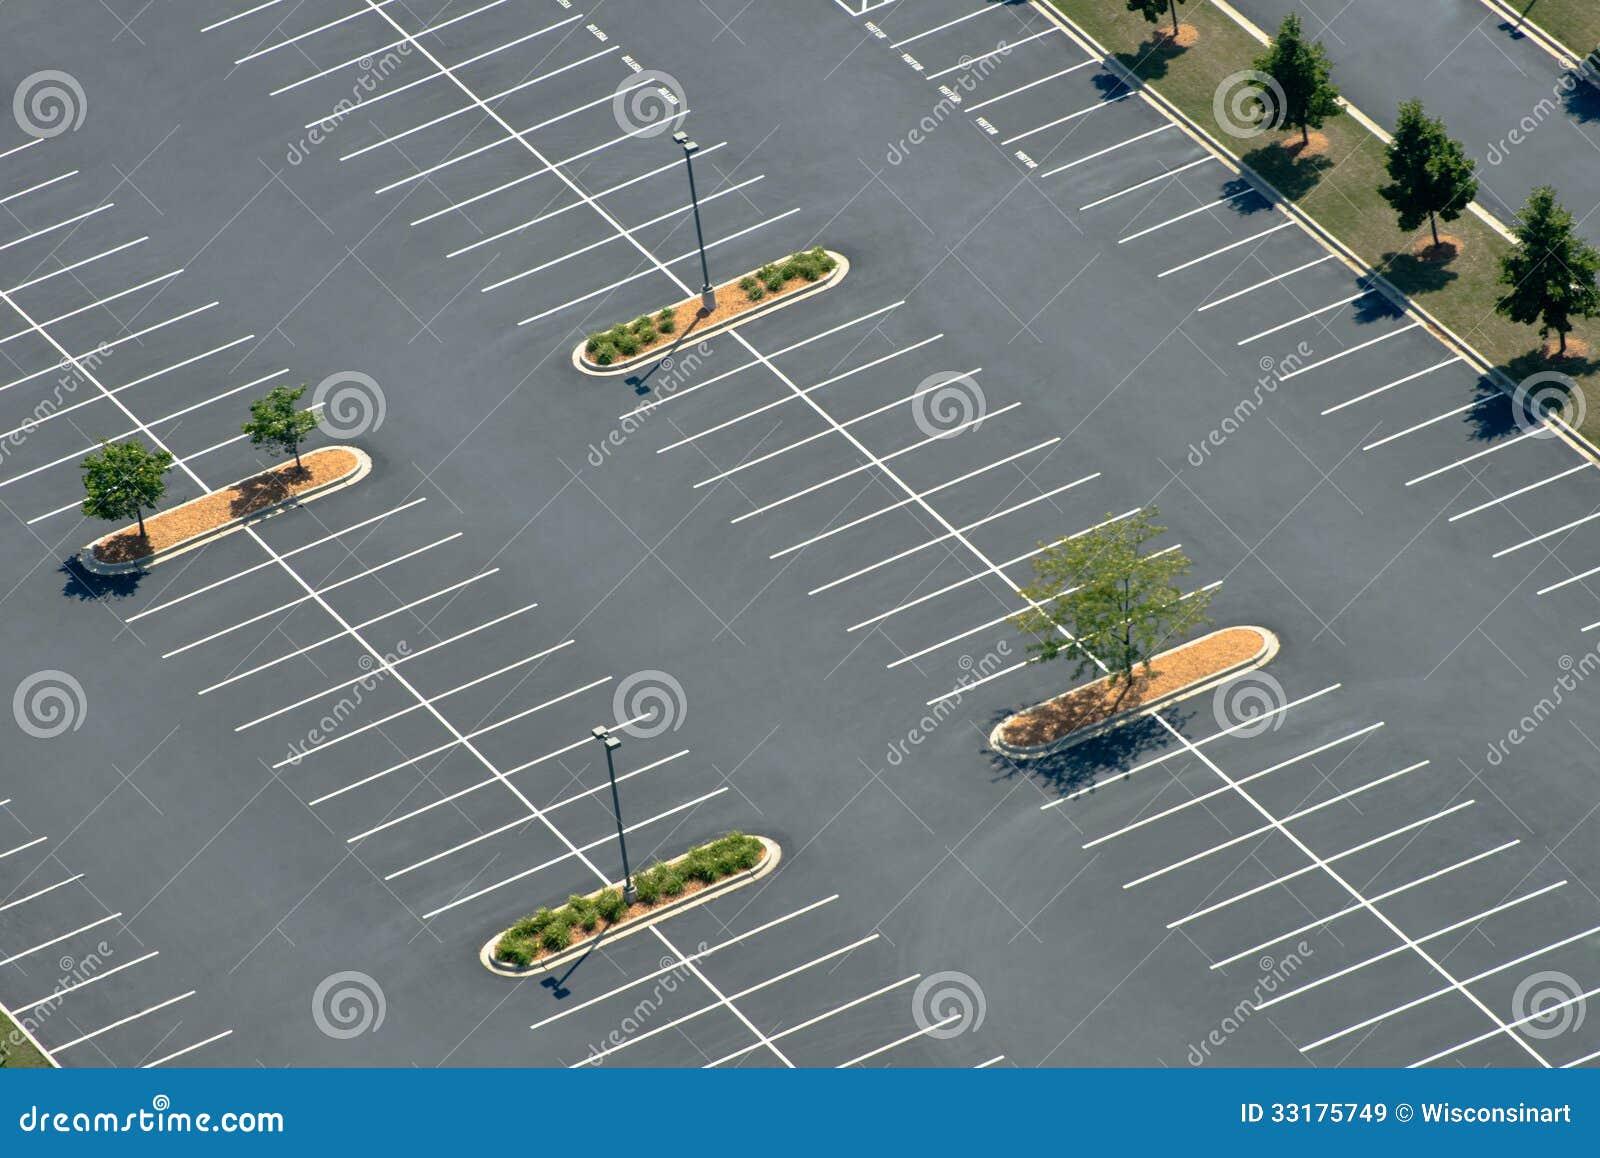 Aerial View of Asphalt Parking lot